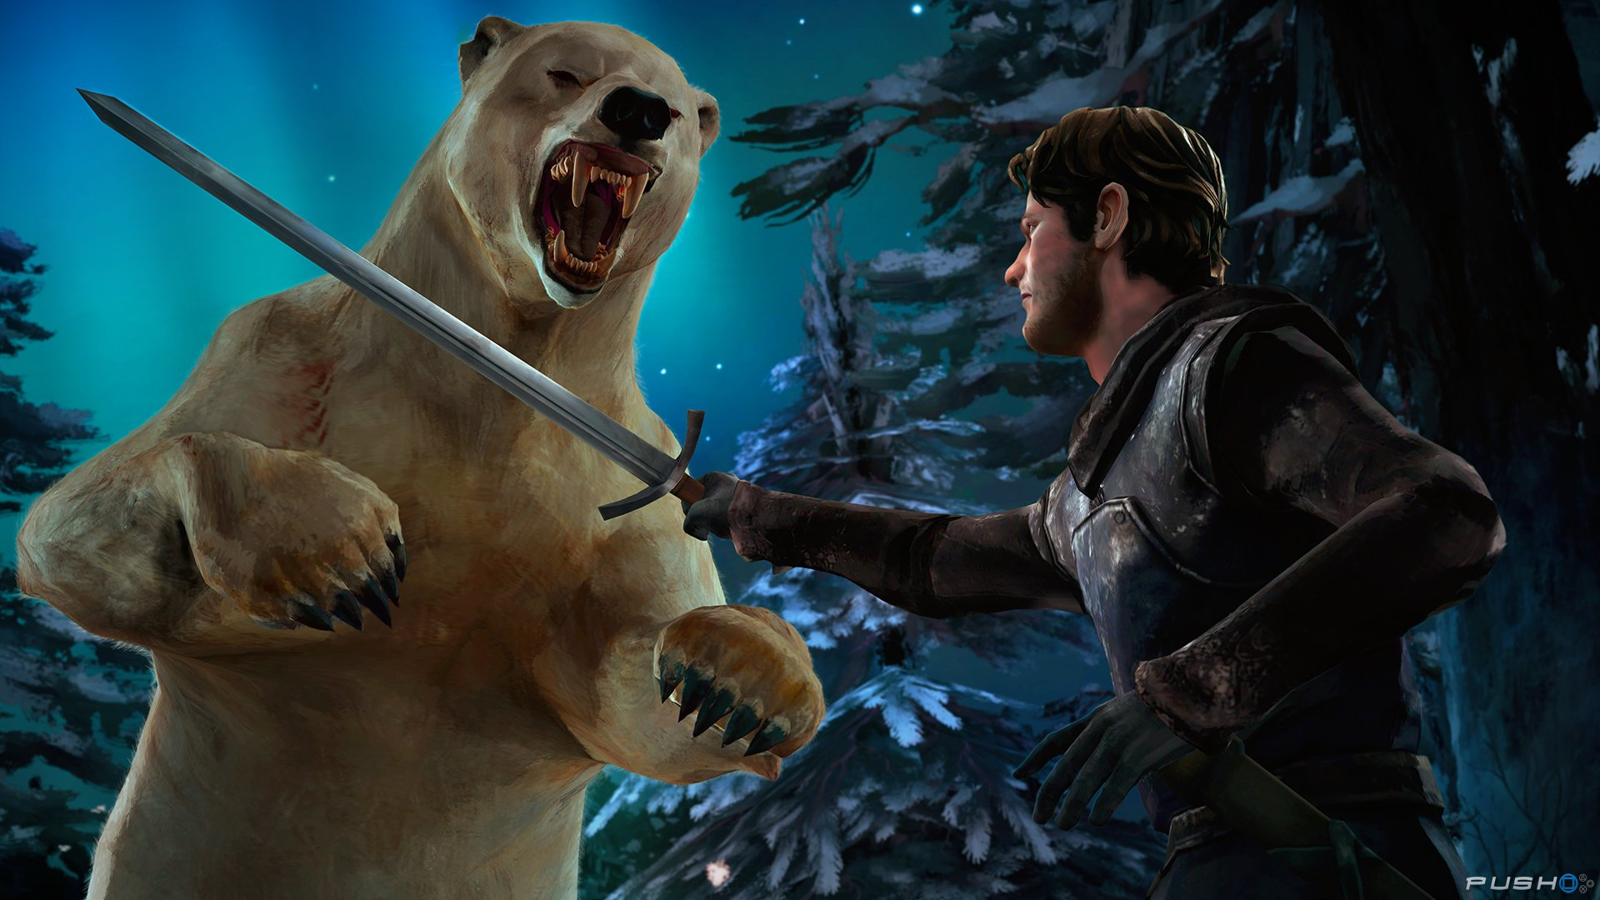 Telltale Confirms Games of Thrones Season Two In Development - 2015-11-23 08:33:09